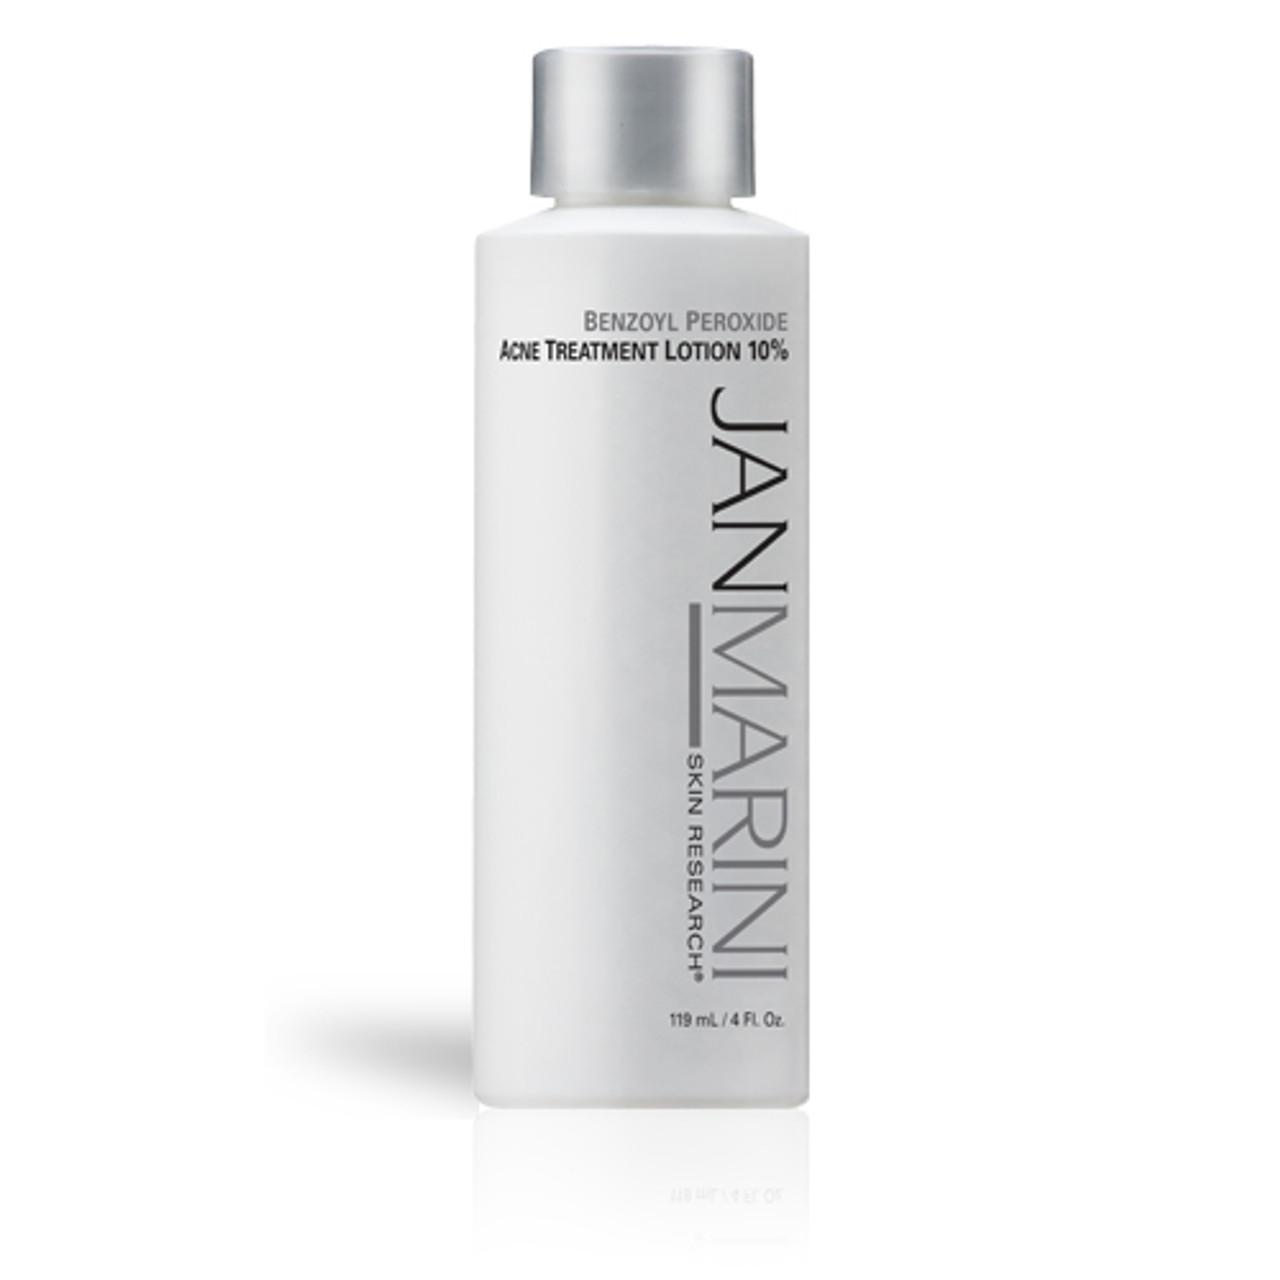 Jan Marini Benzoyl Peroxide Acne Treatment Lotion BeautifiedYou.com